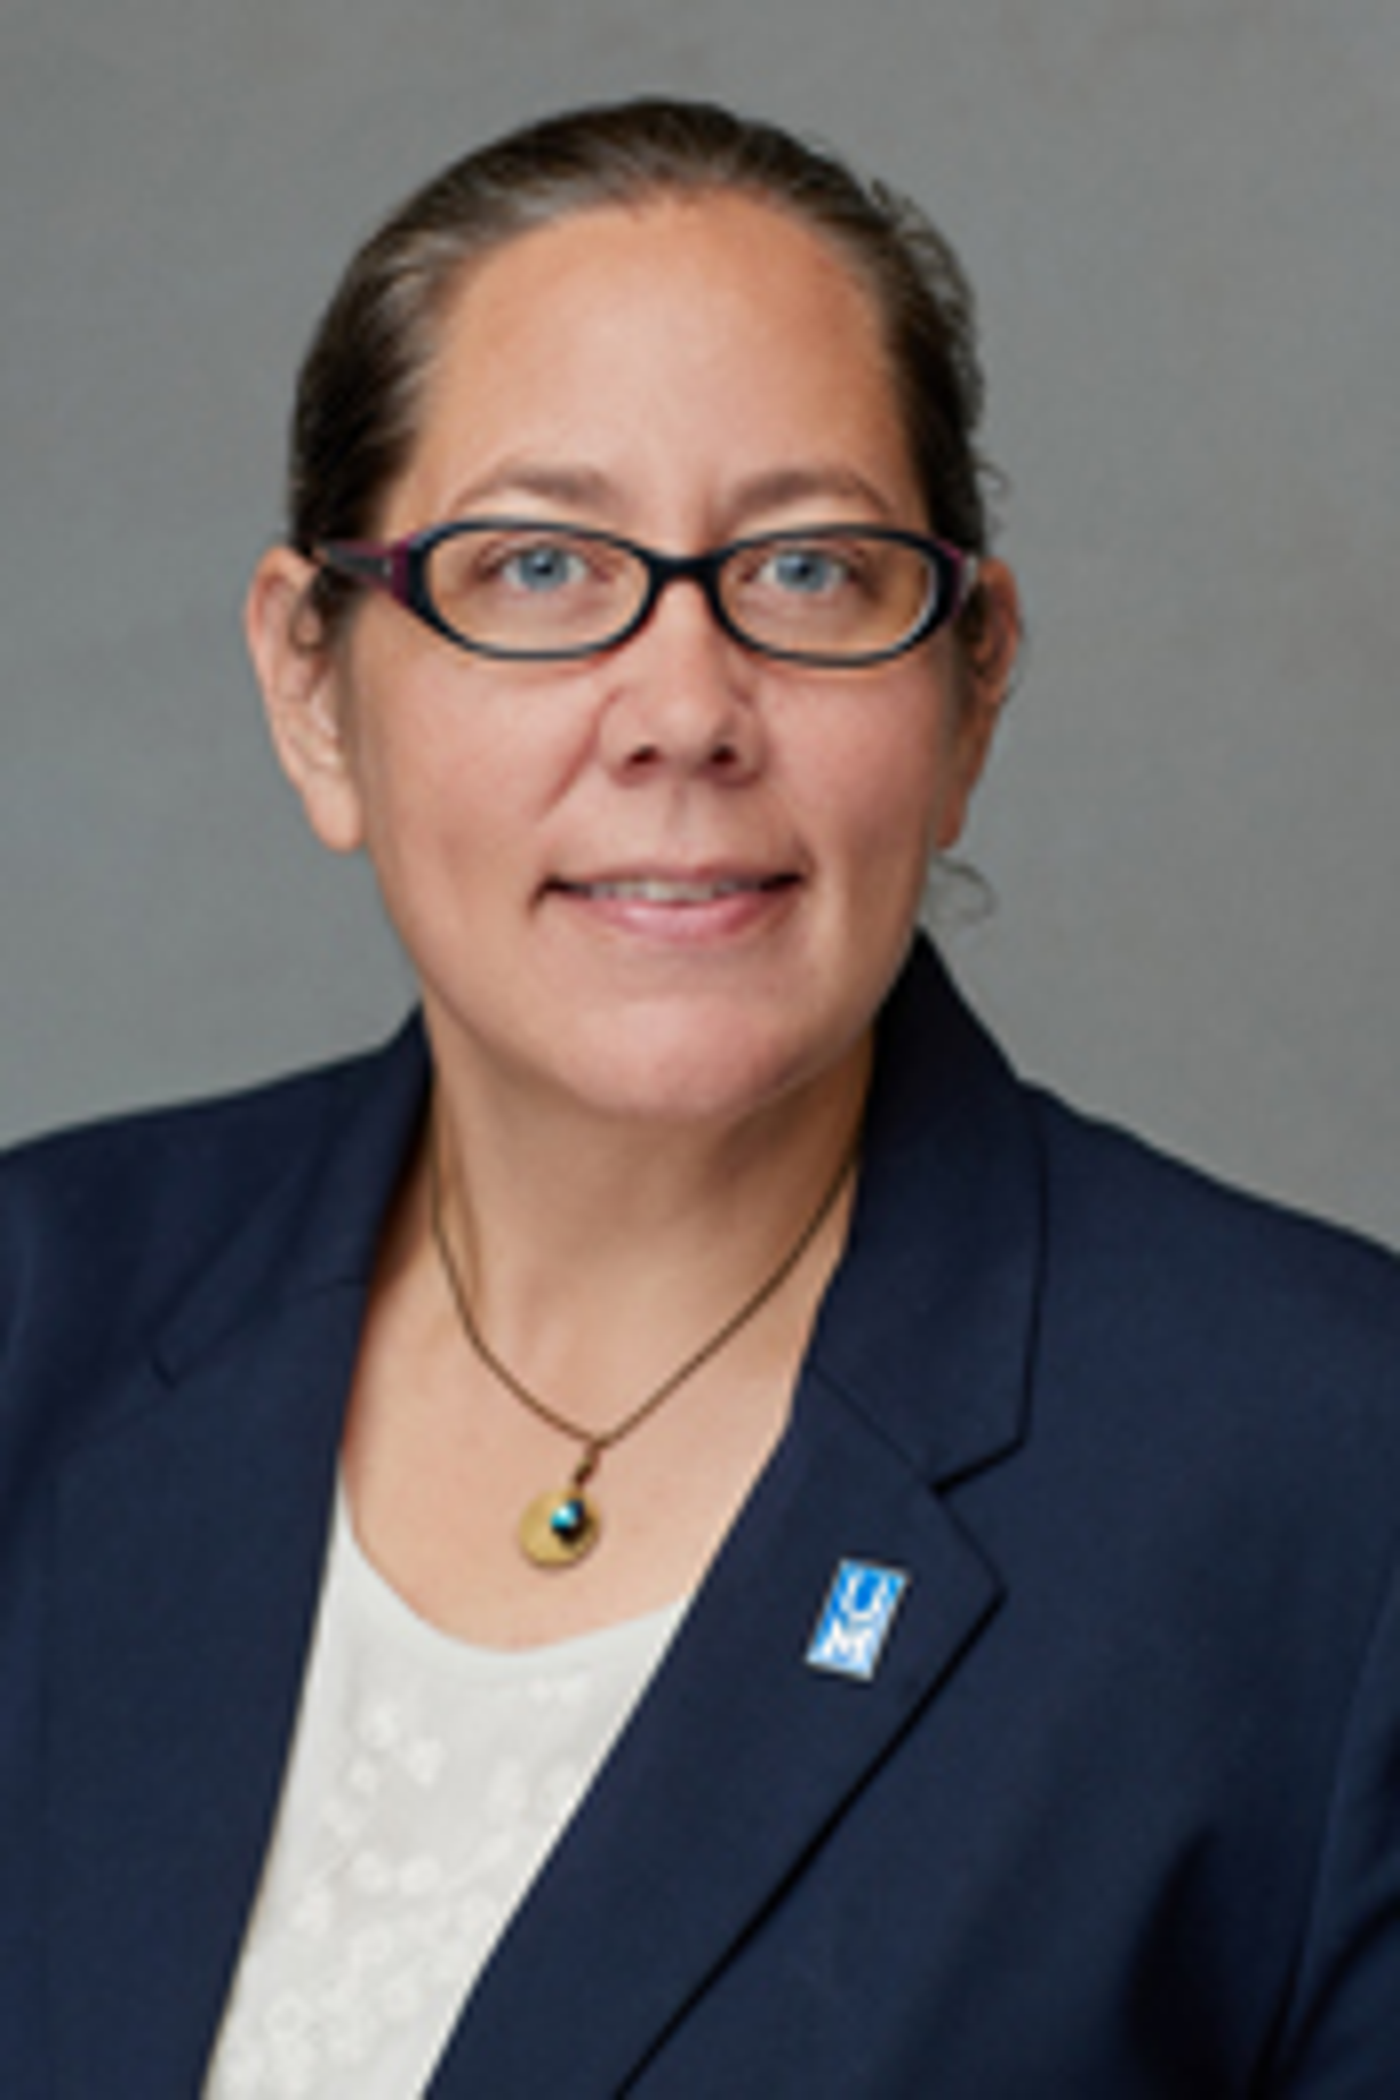 Dr. Melissa Hirschi